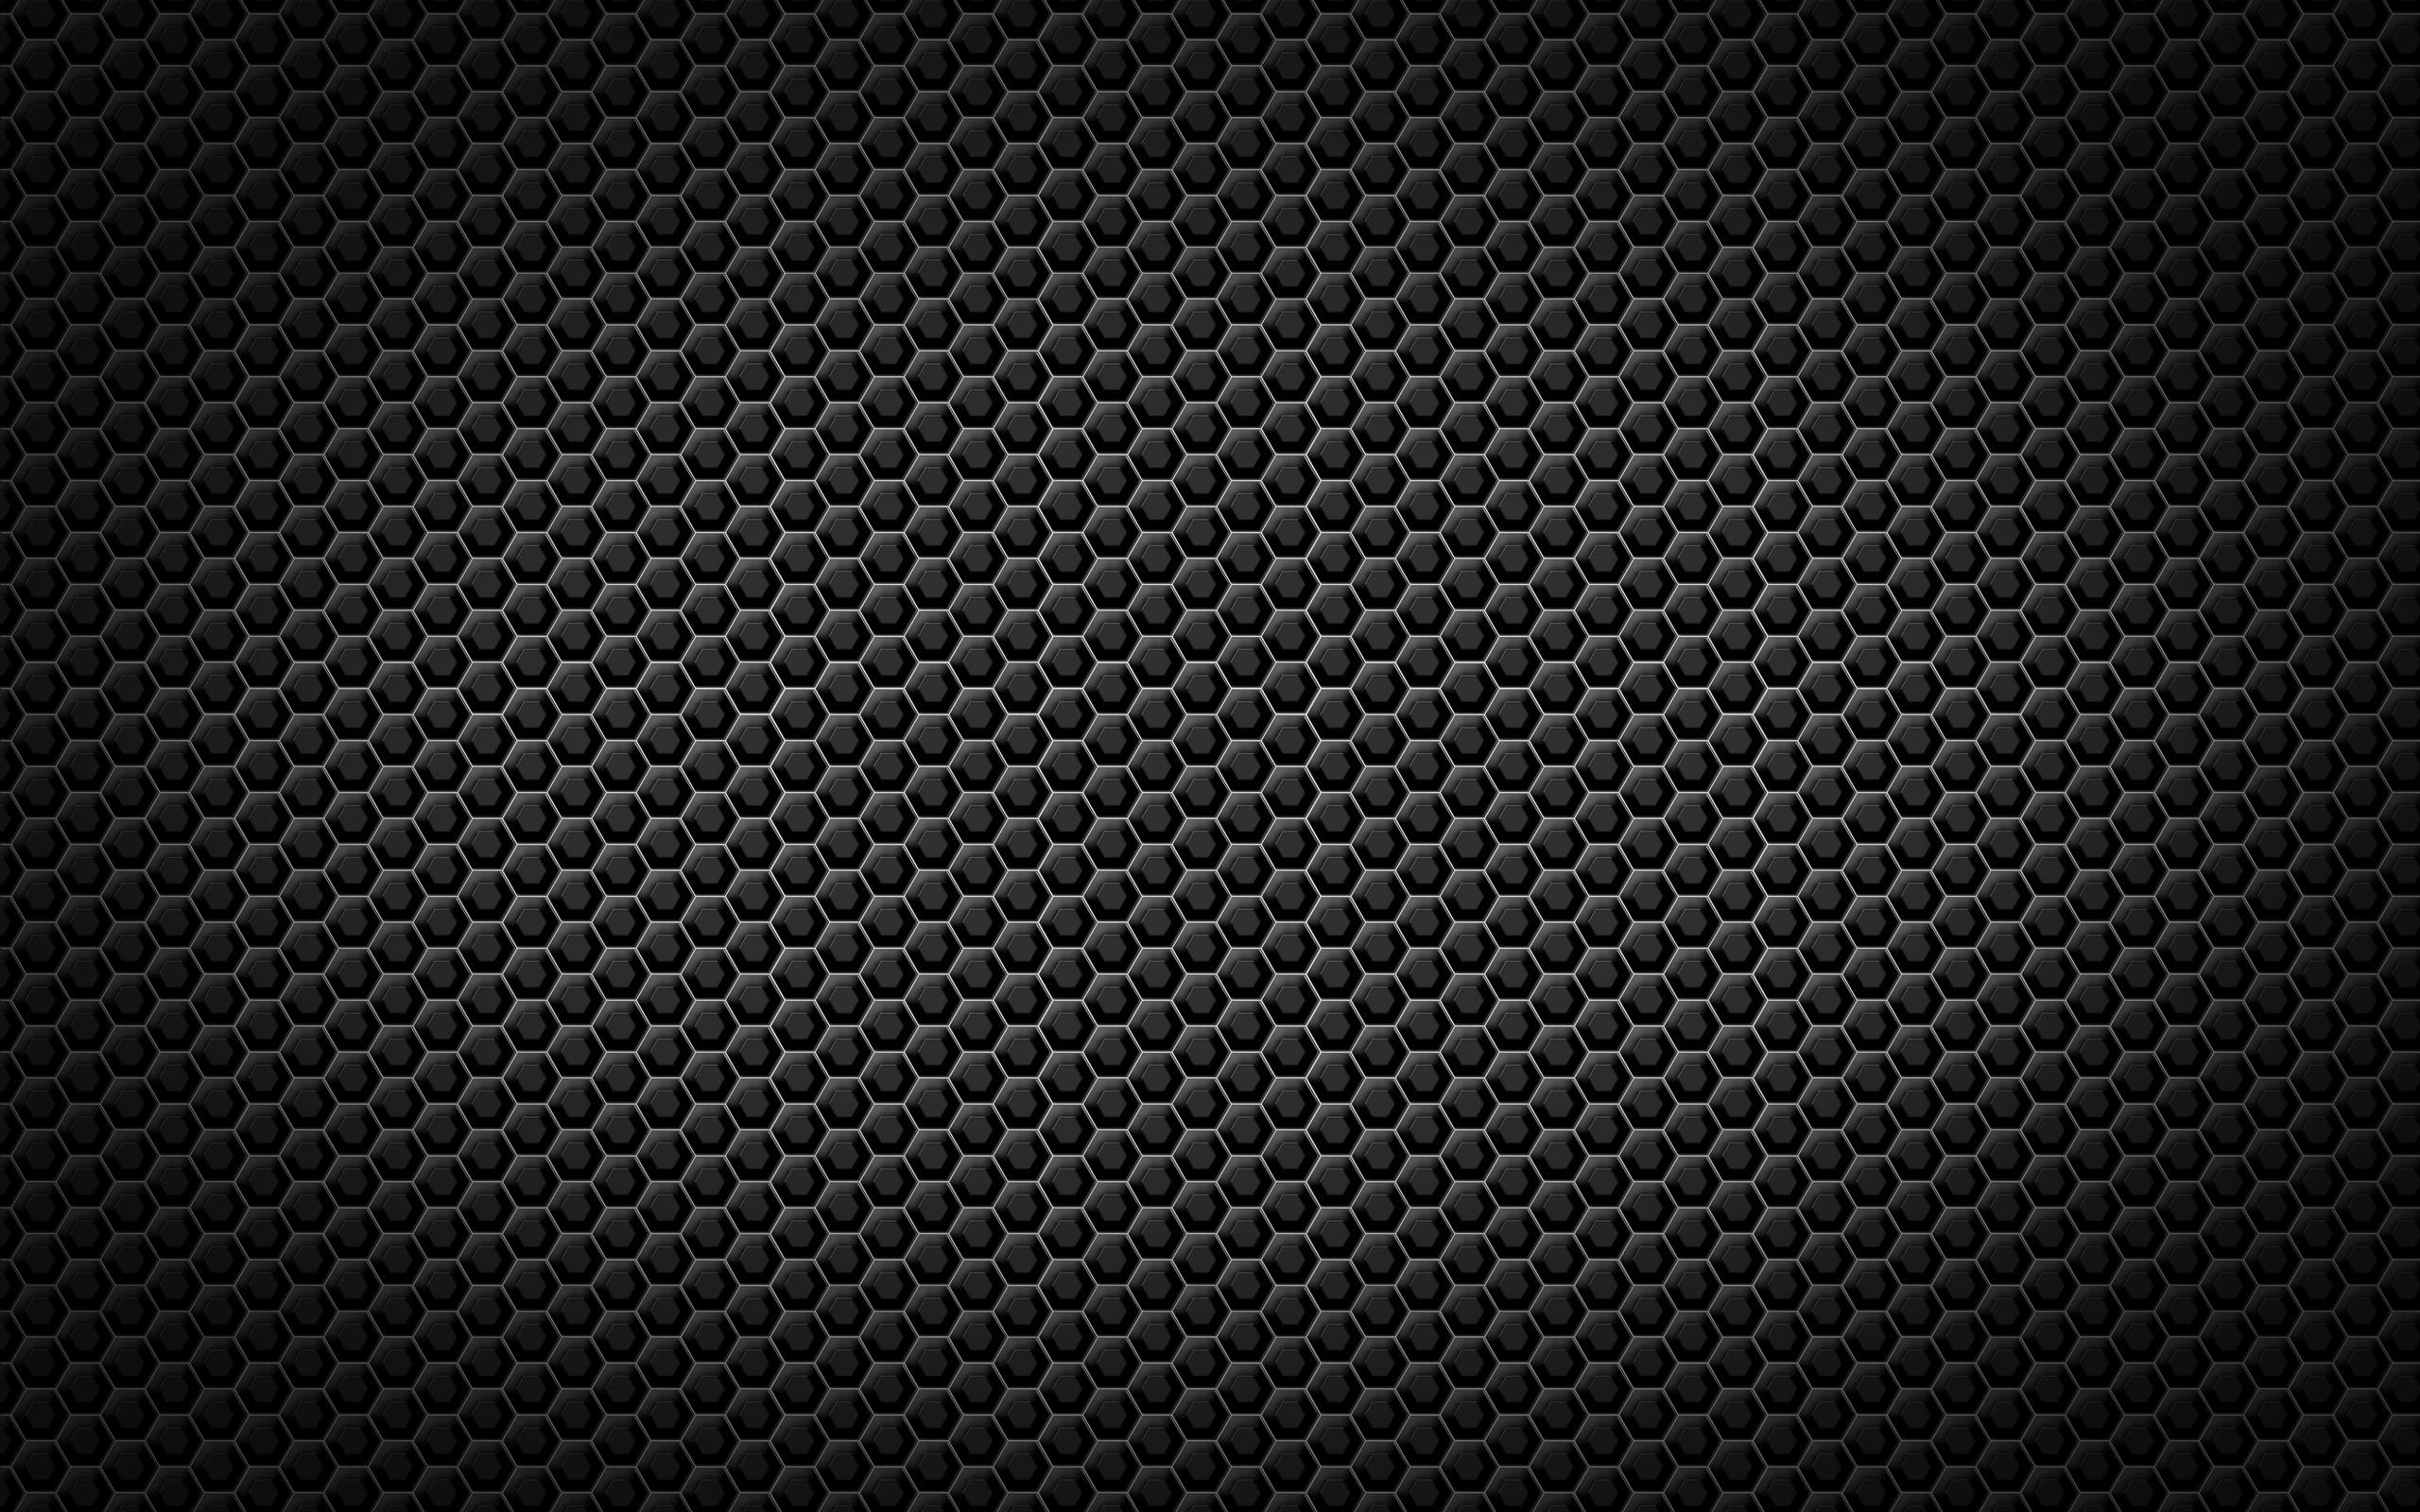 Black Wallpapers For Desktop  5 High Resolution Wallpaper